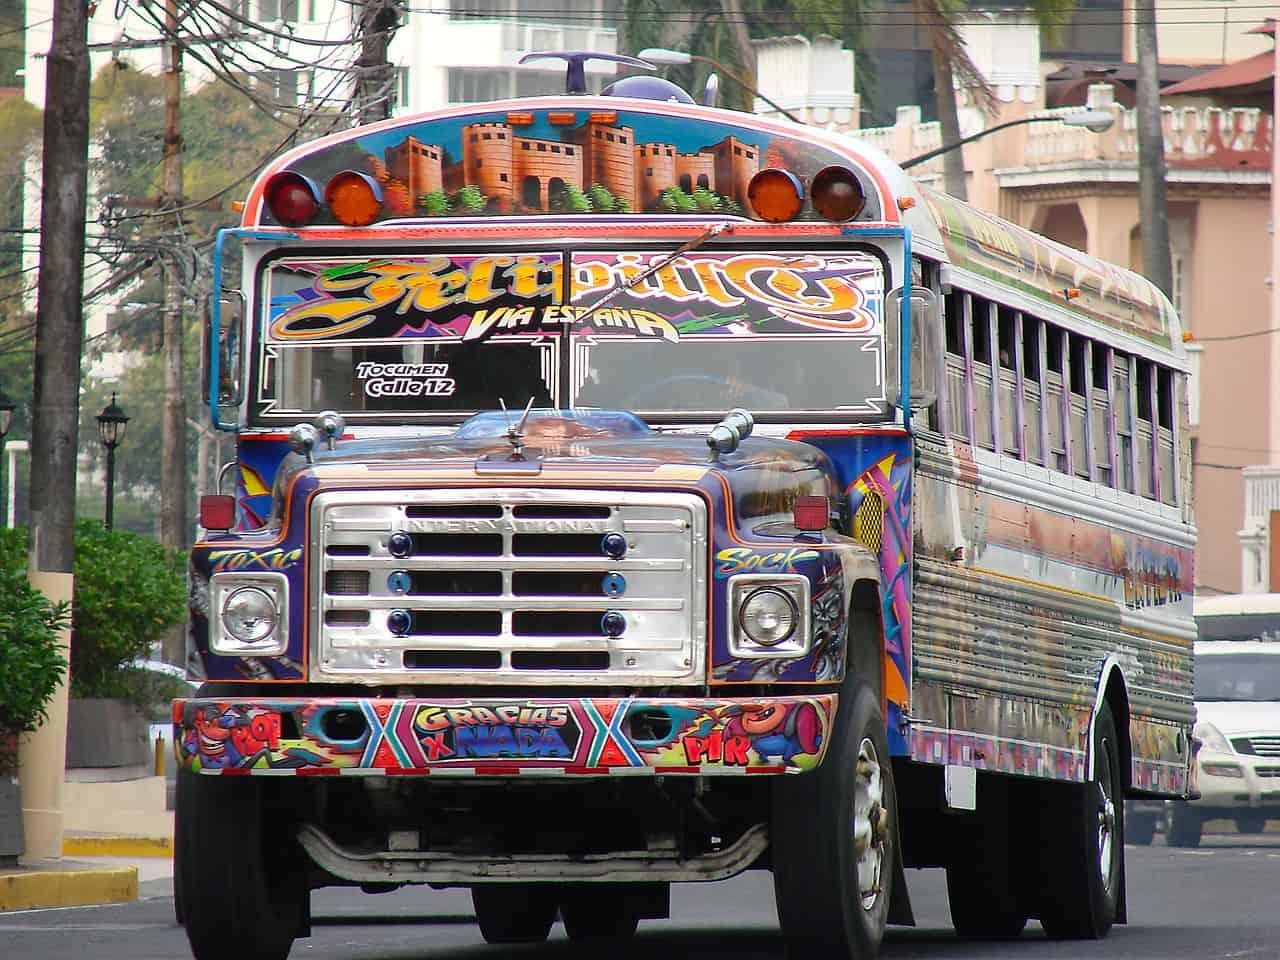 service bus, panama, city-879697